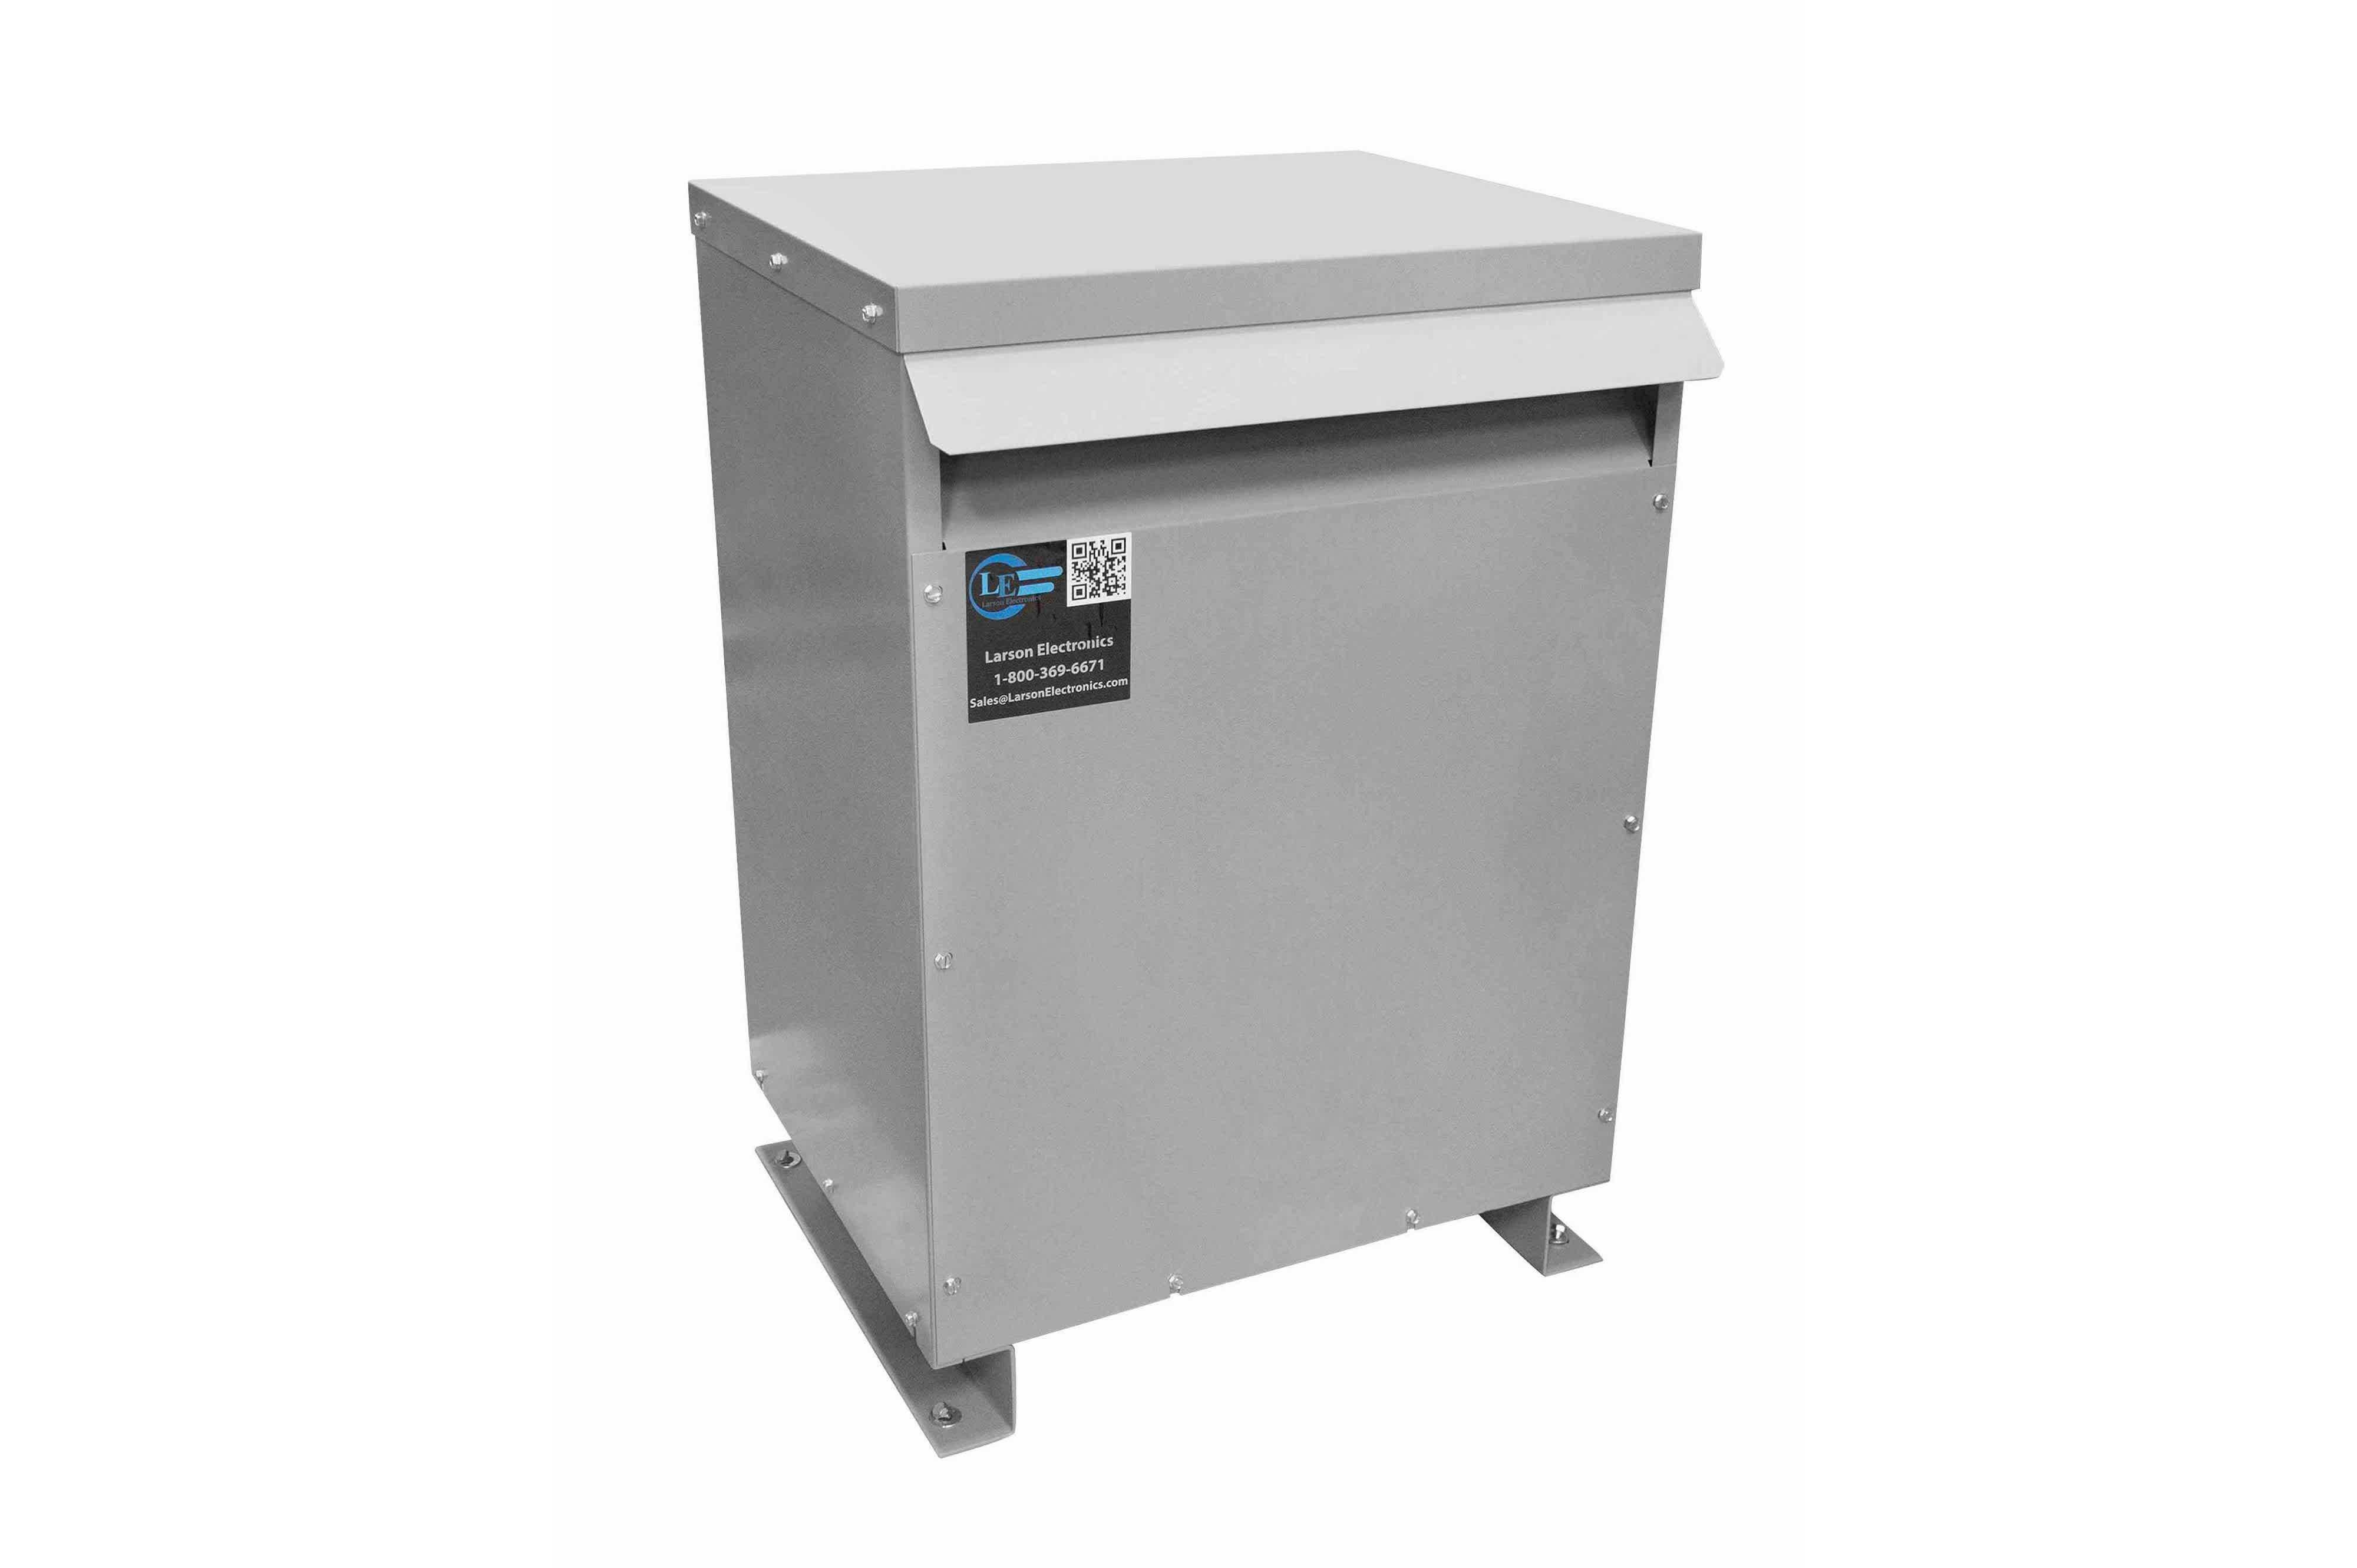 500 kVA 3PH Isolation Transformer, 208V Wye Primary, 600V Delta Secondary, N3R, Ventilated, 60 Hz